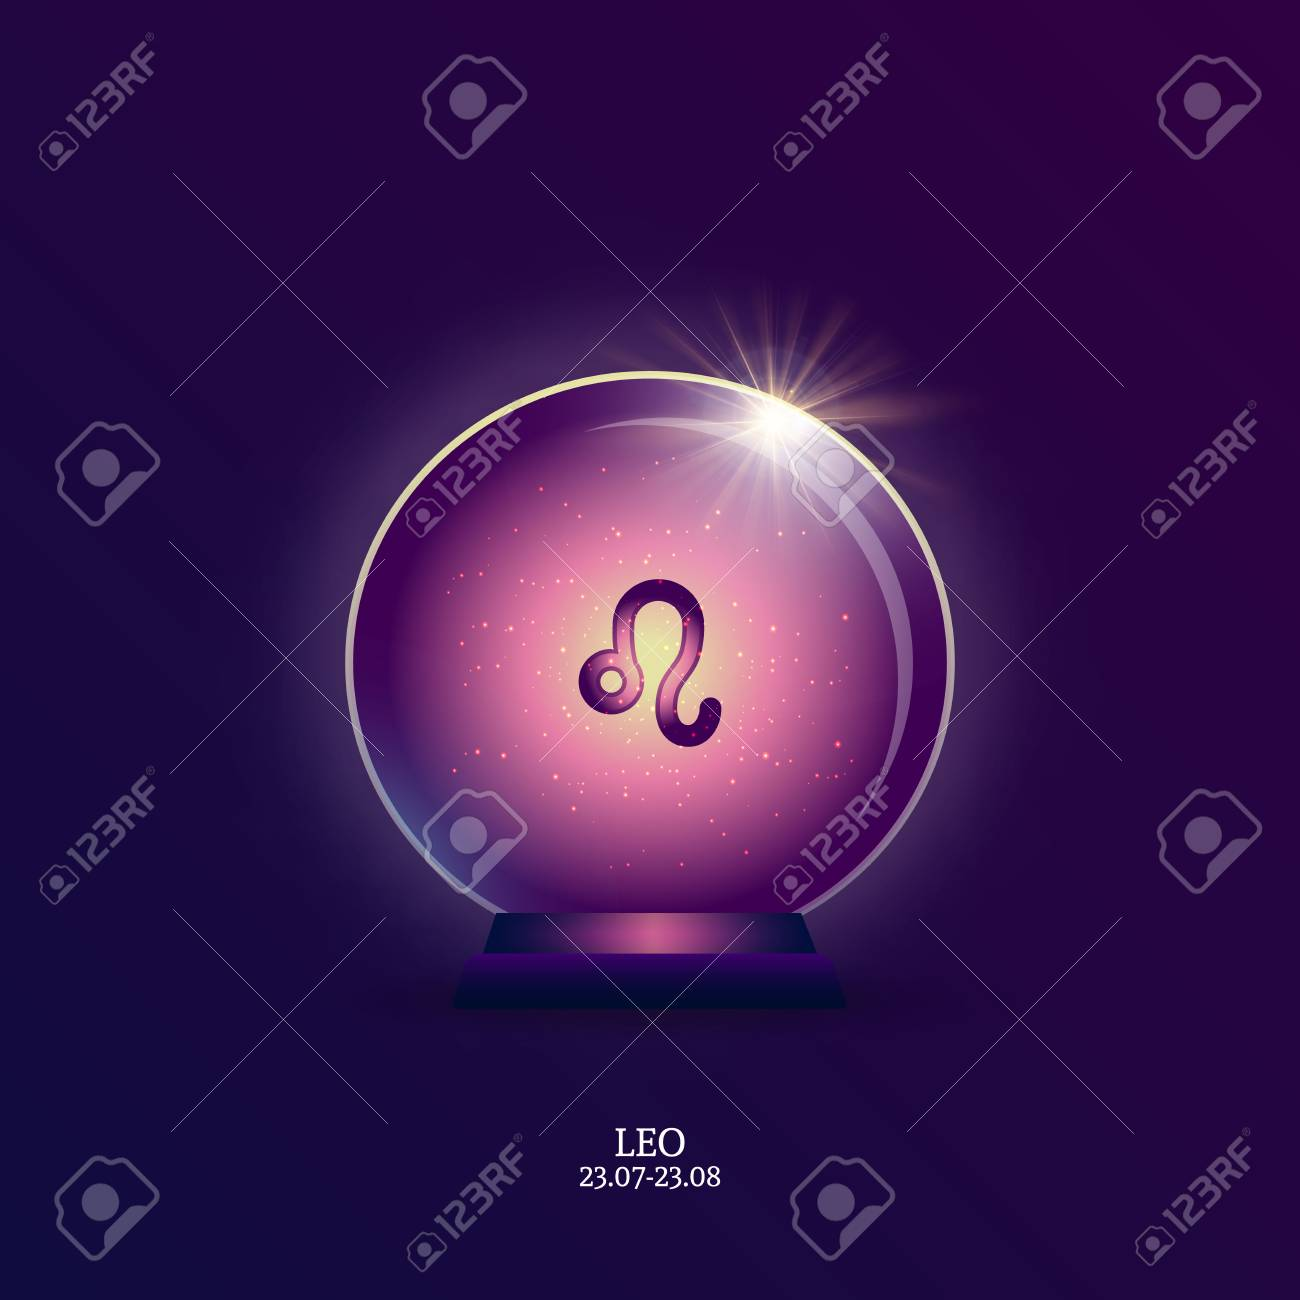 Leo  Horoscope sign  Zodiac Icon in magic ball